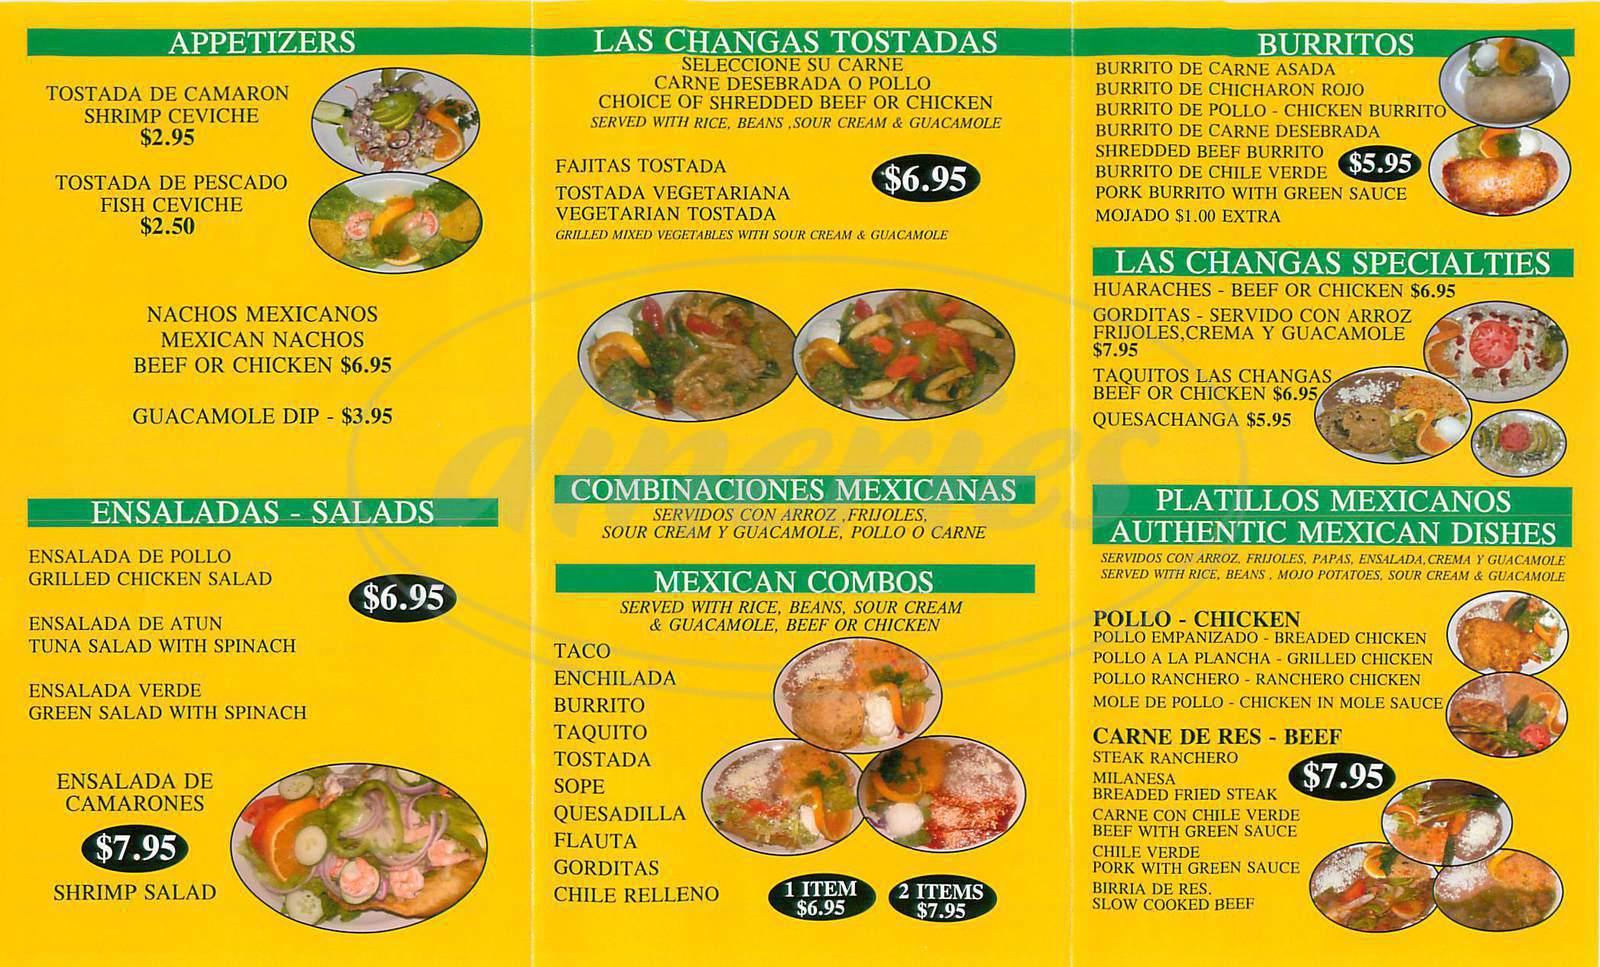 menu for Las Changa's